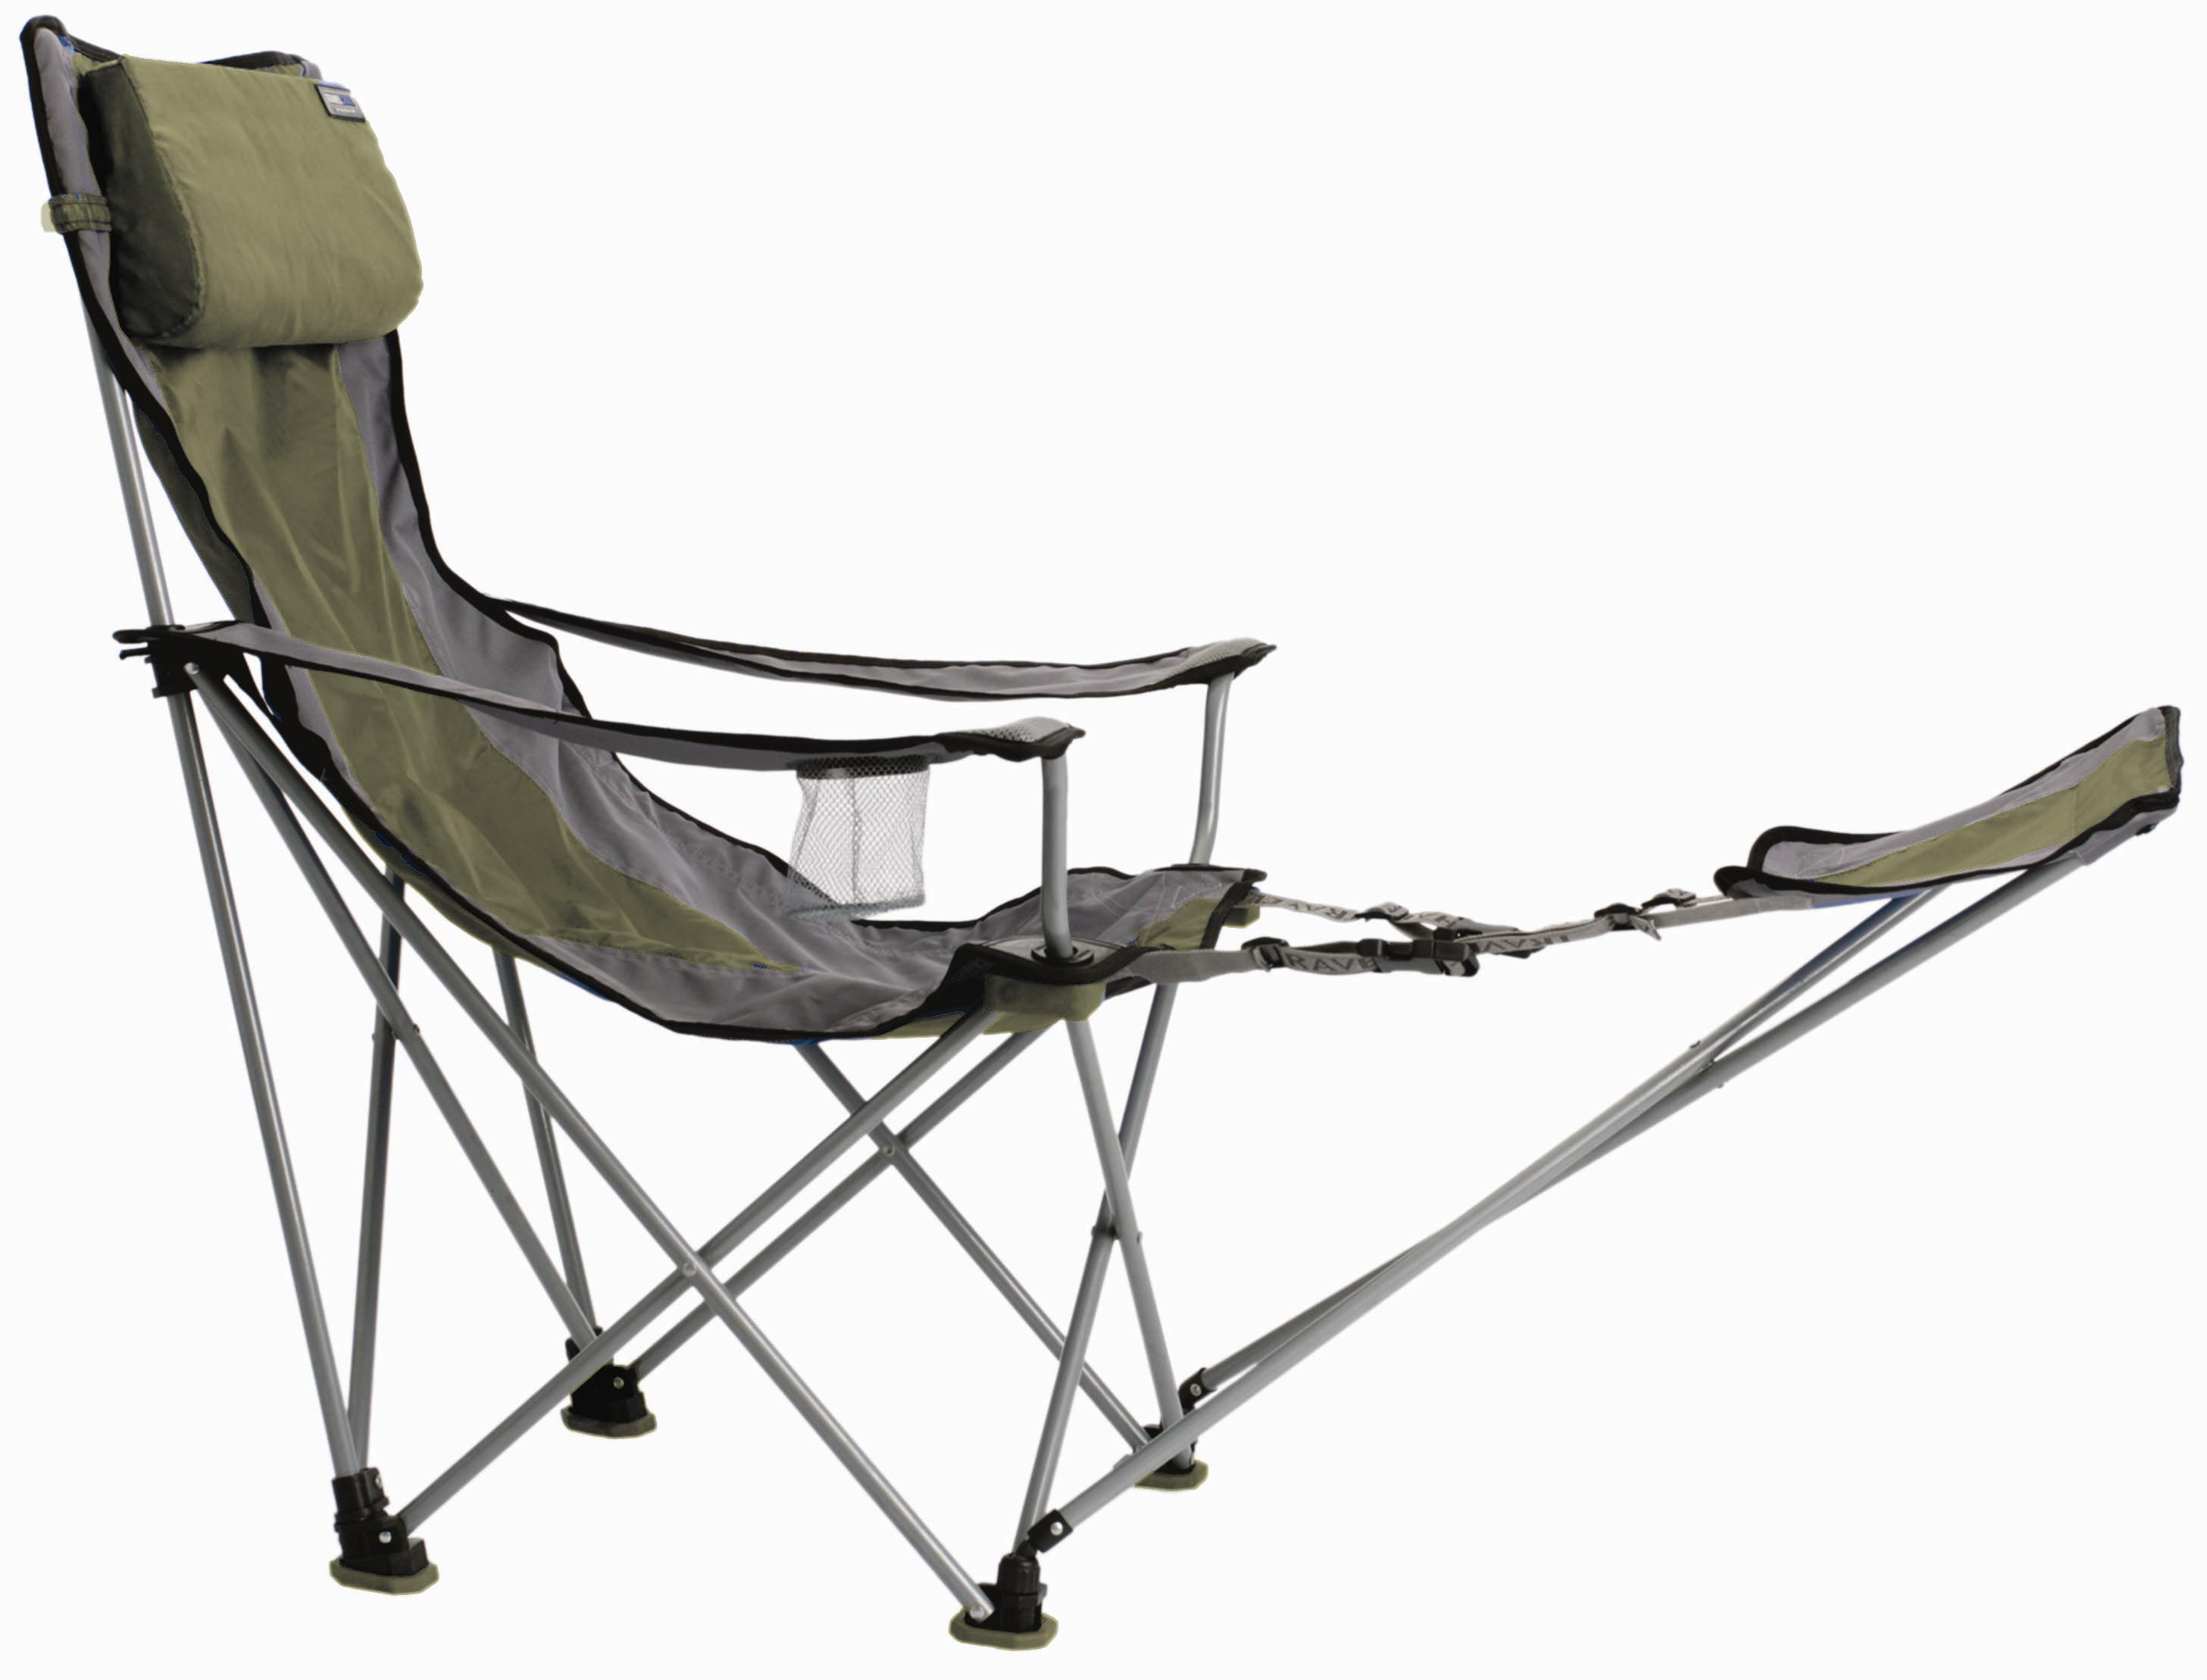 Folding Outdoor Chairs Travel Chair Bubba Green Ntjxfbo